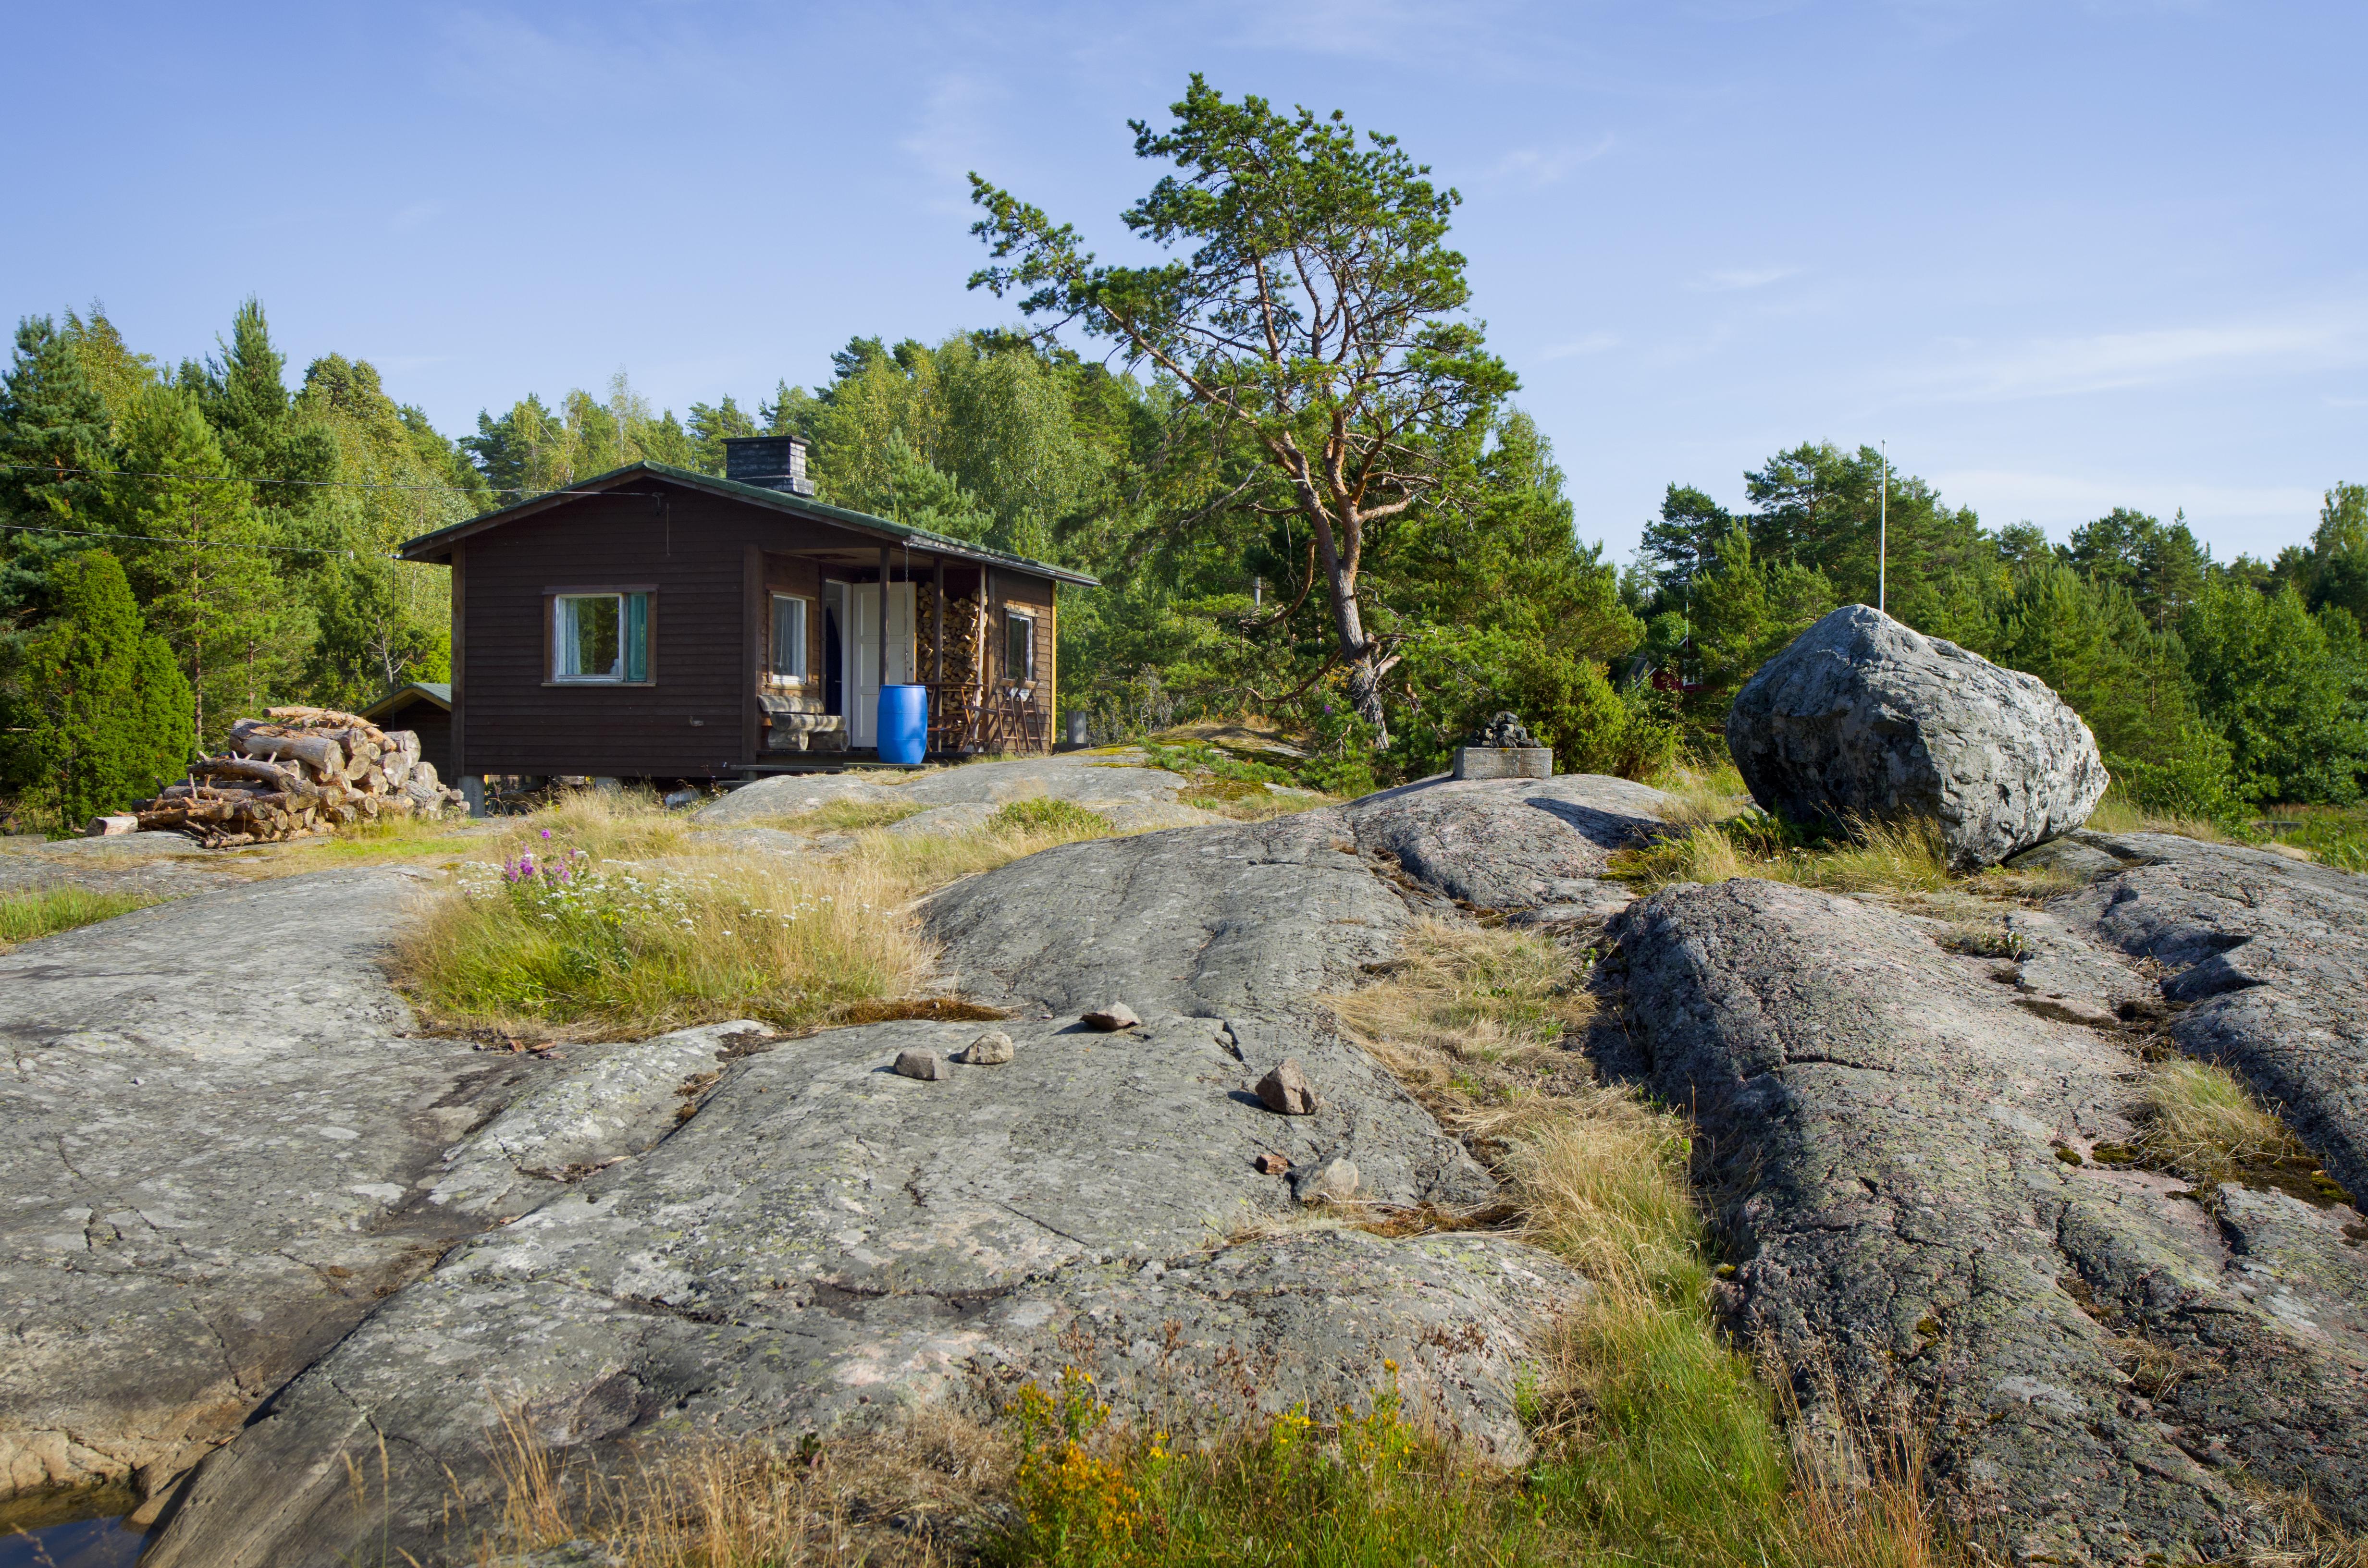 ¡A sudar a la sauna! - Finlandia Circuito Perlas del Báltico, Rusia Imperial y Anillo de Oro